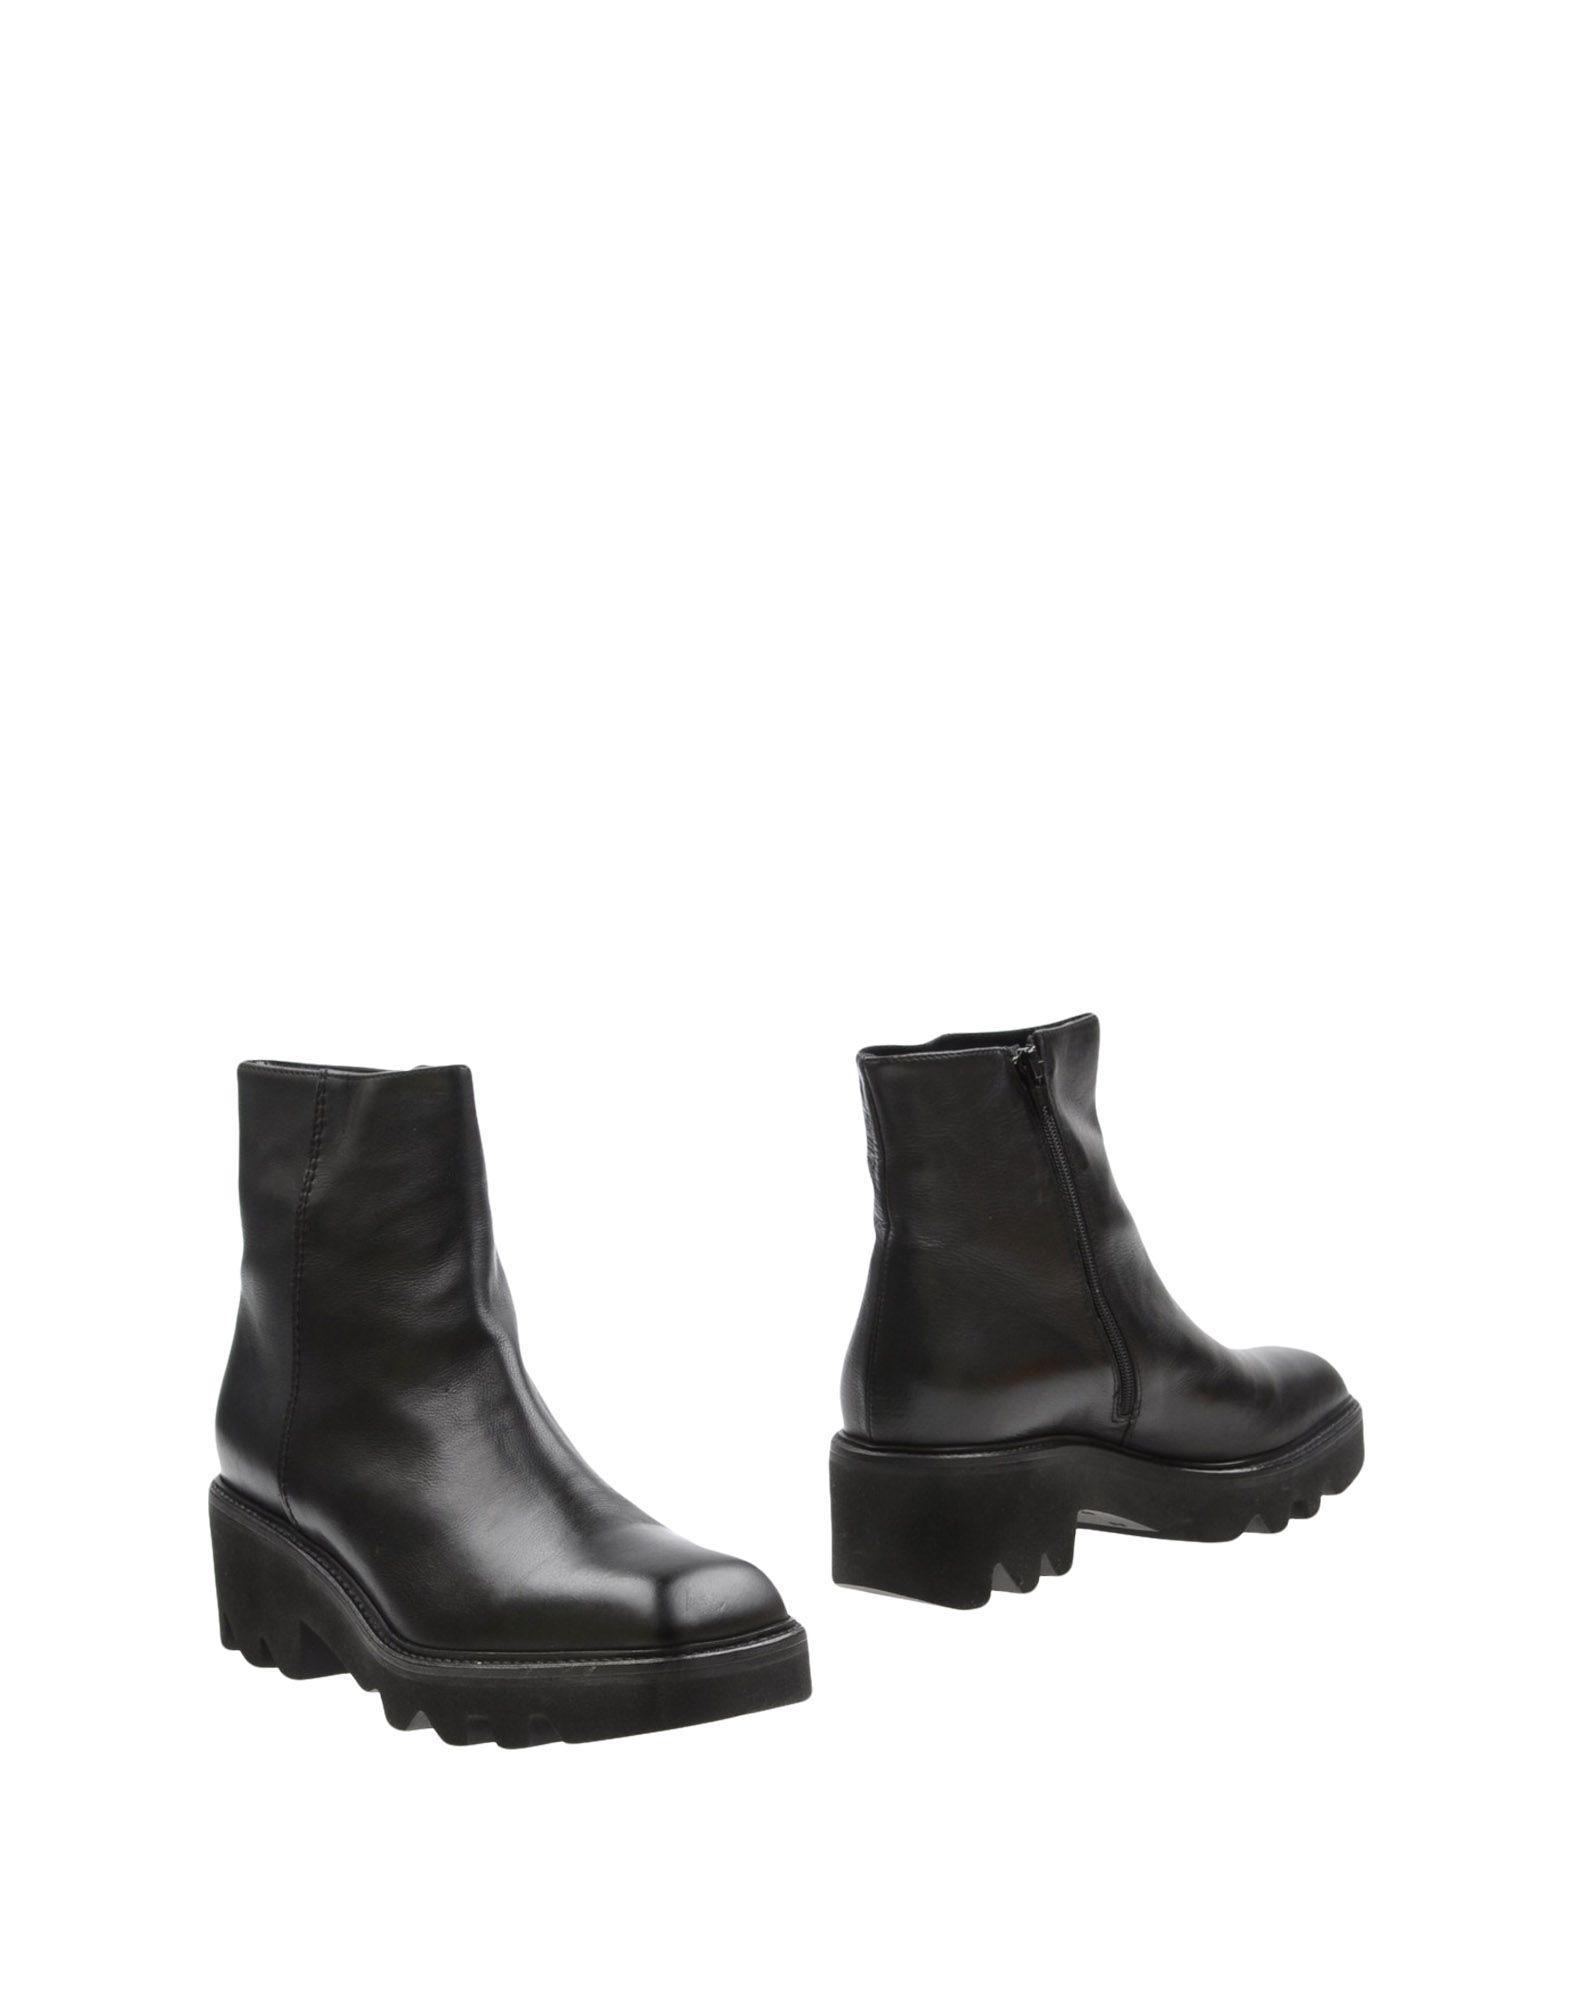 87 Vic Matiē Stiefelette strapazierfähige Damen  11306304FLGut aussehende strapazierfähige Stiefelette Schuhe 9c20d9